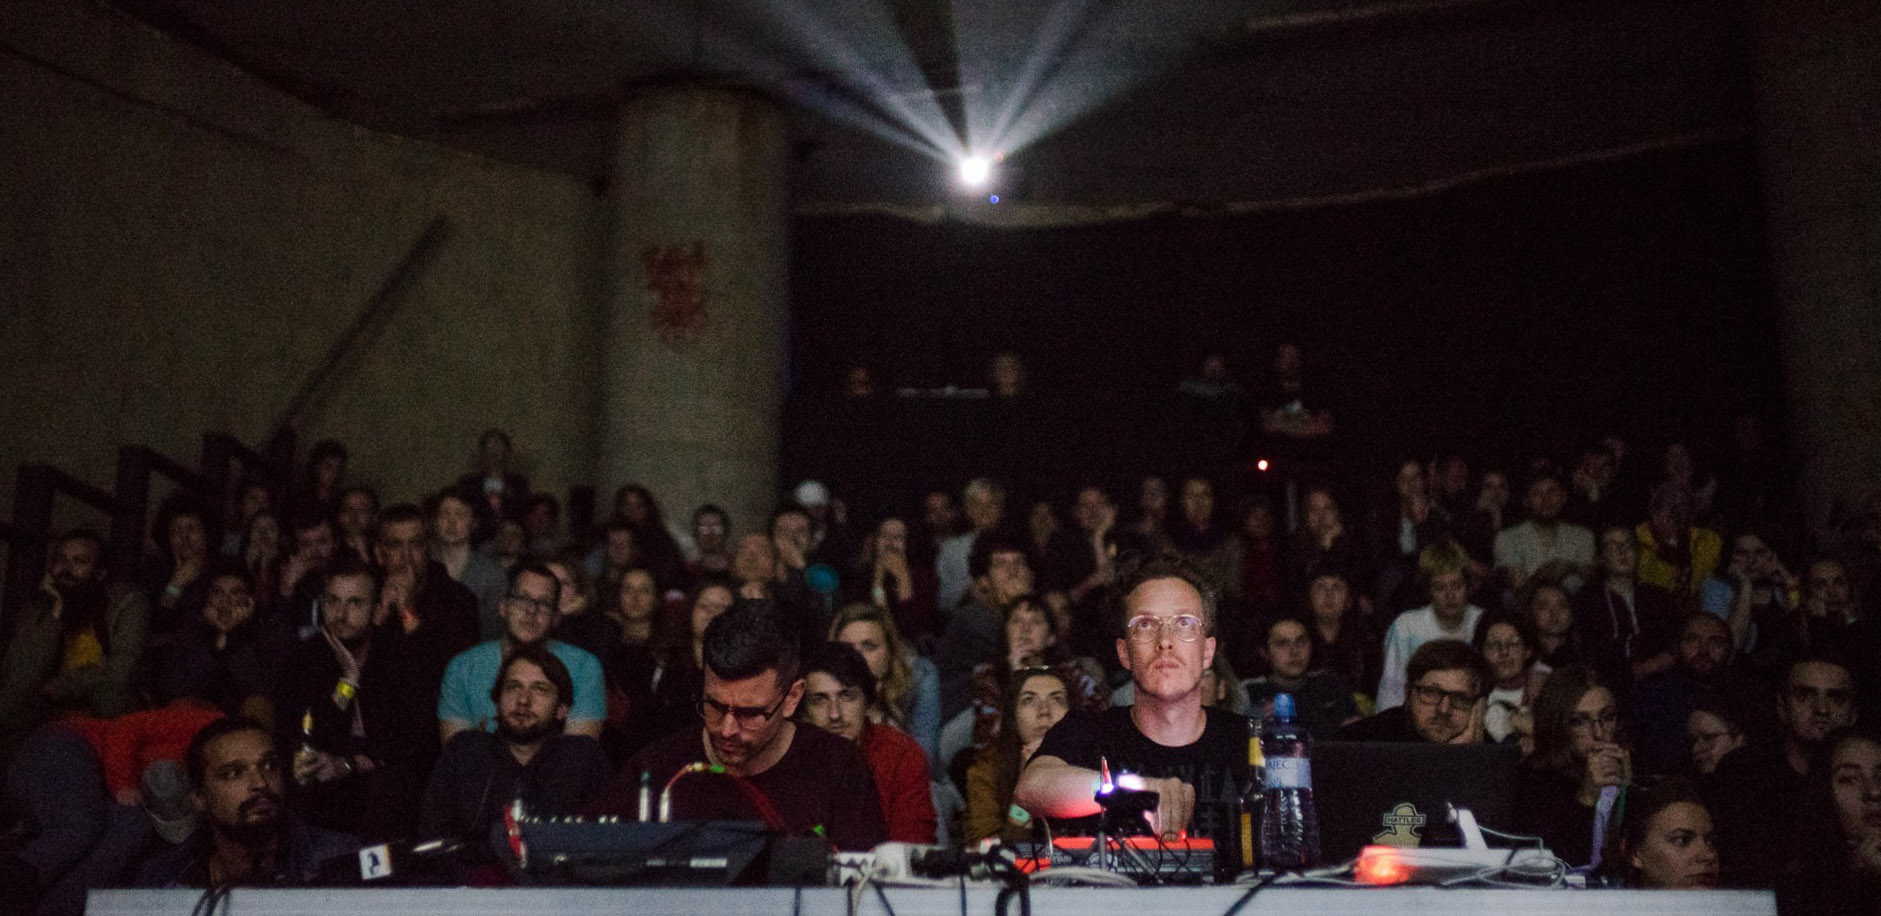 MAX HATTLER: audiovisual performances